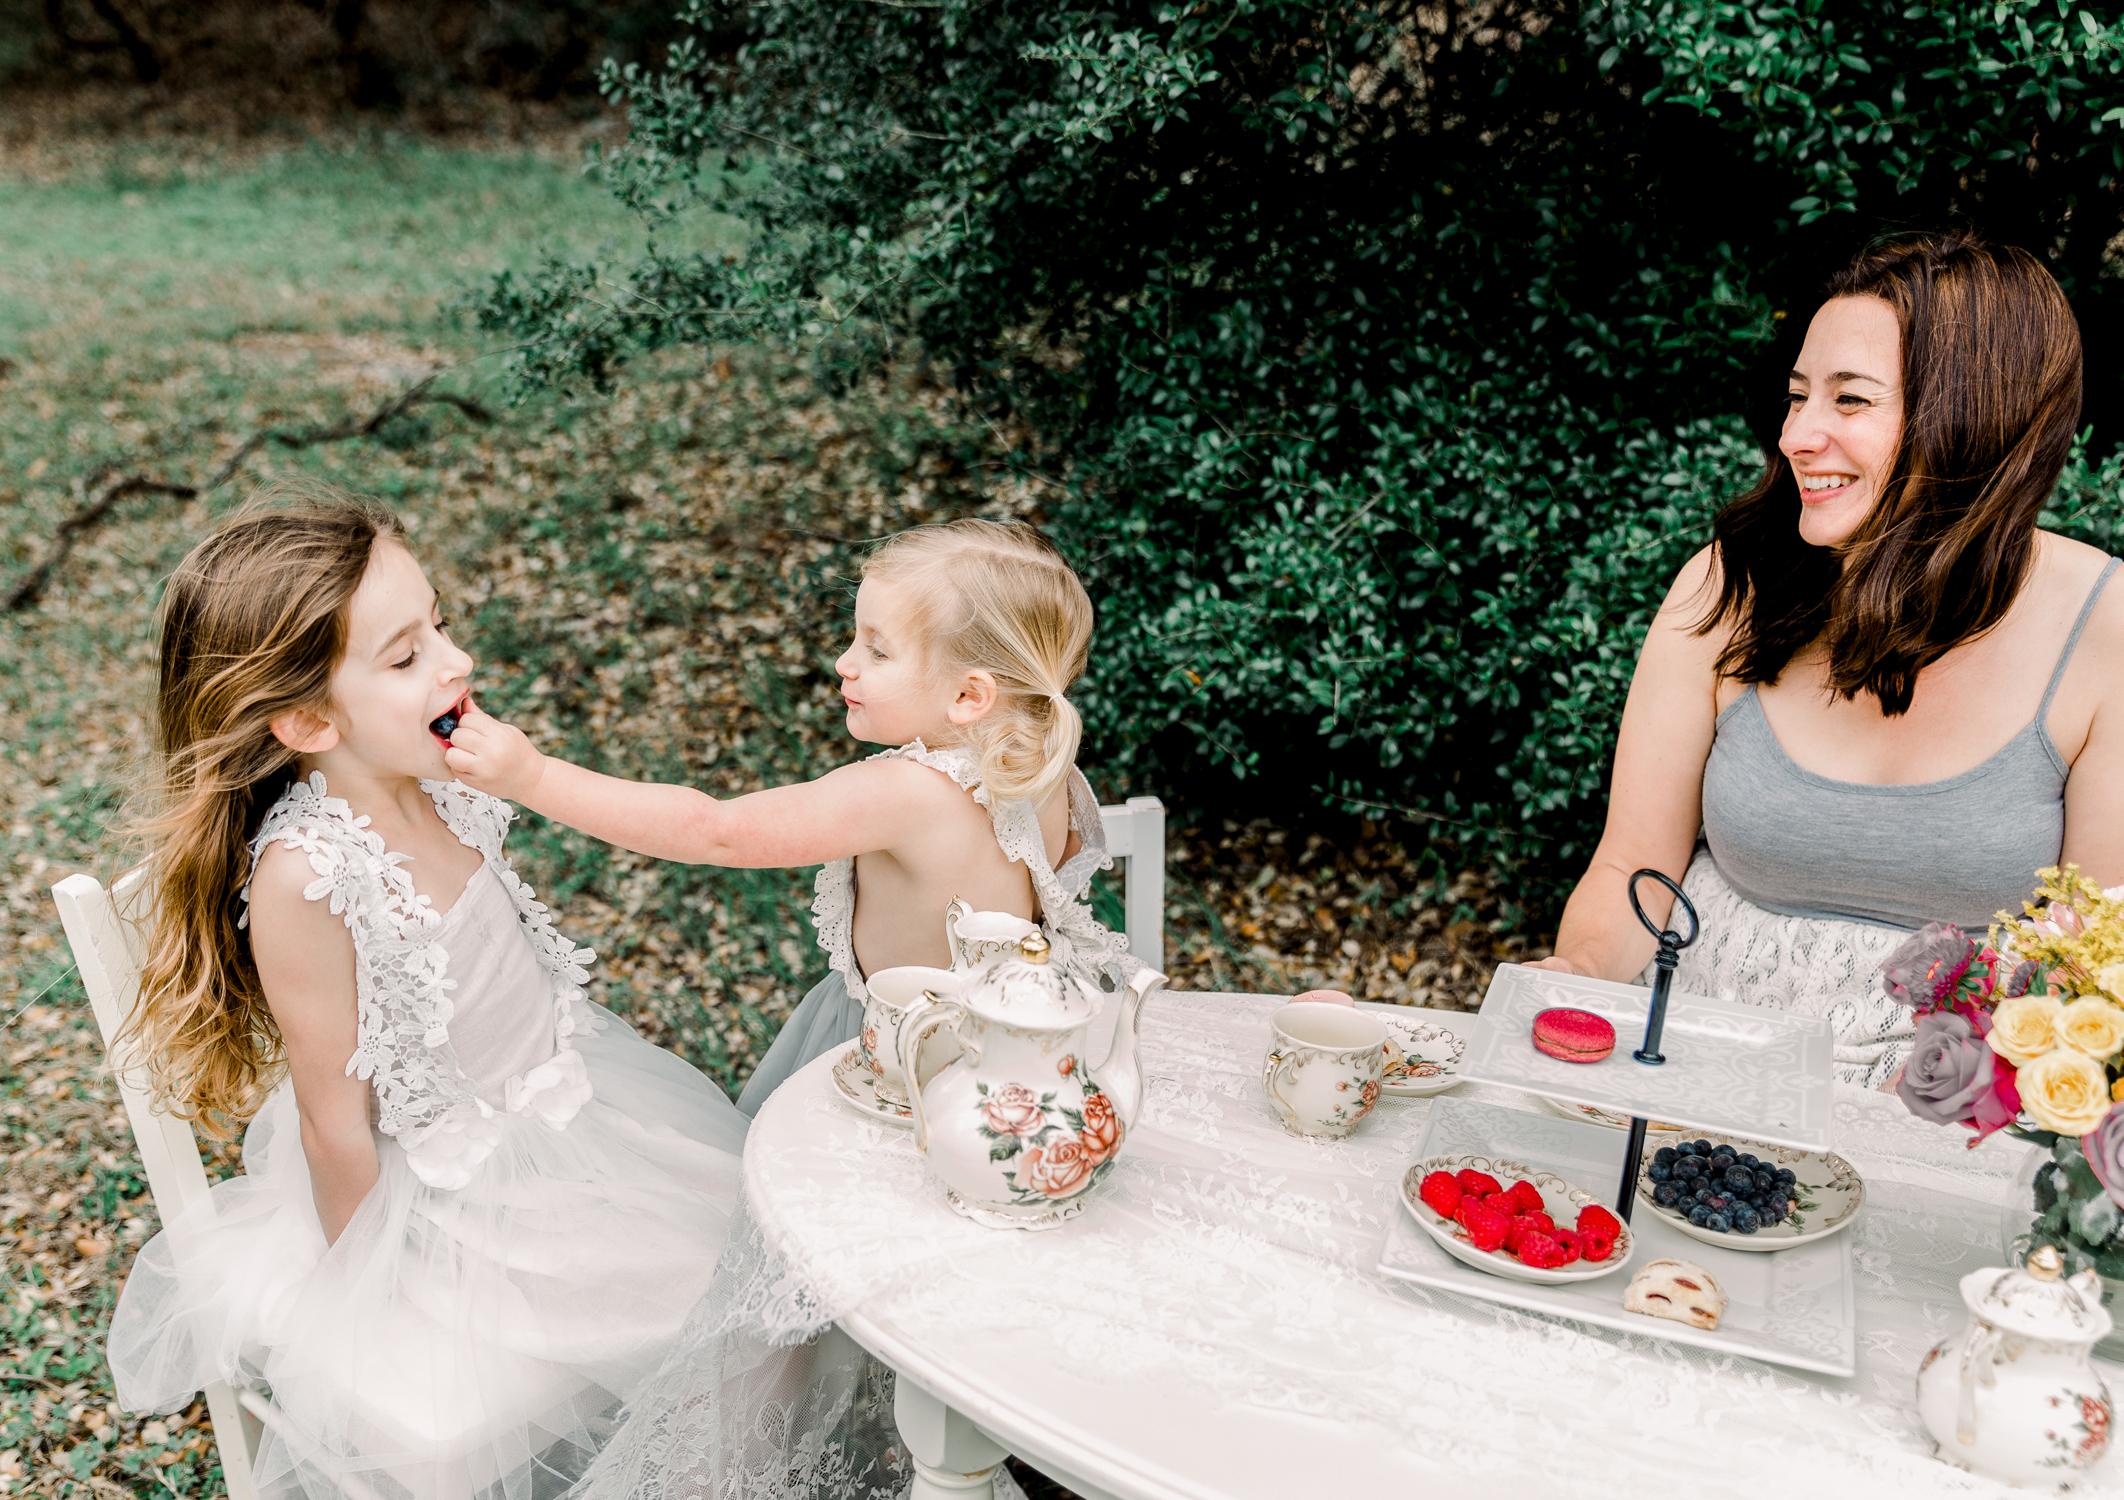 lifestyle-family-photographer-franklin-tea-time-21.jpg